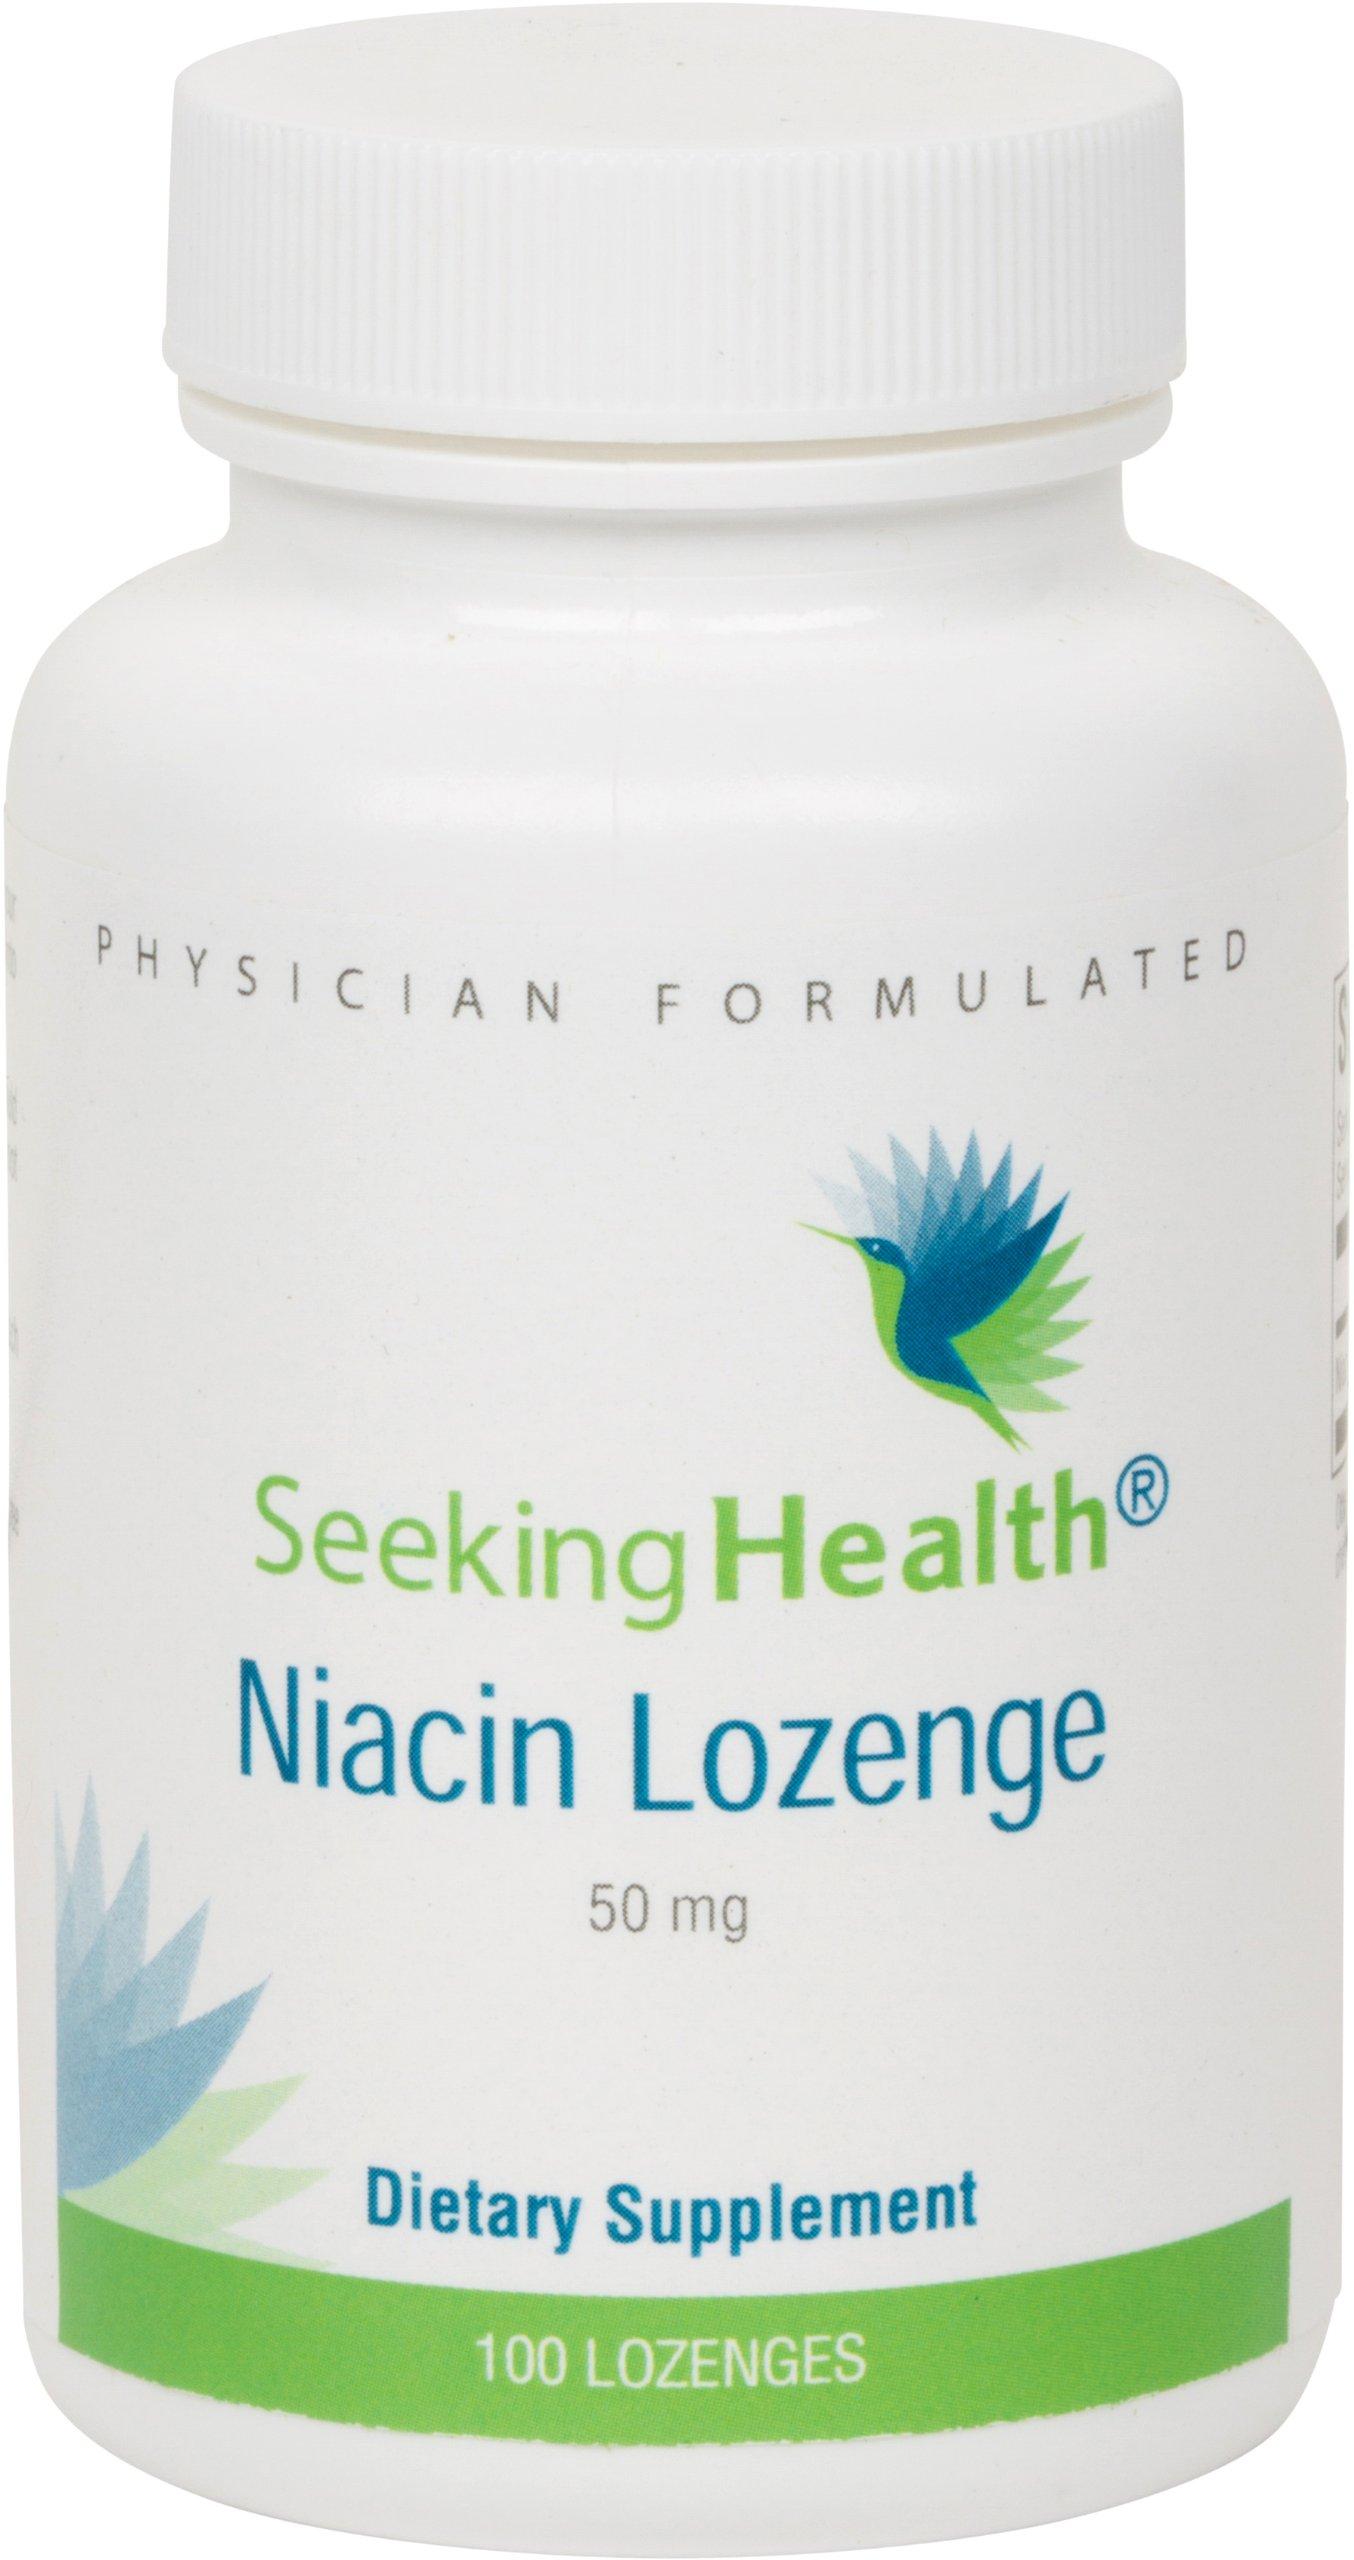 Niacin Lozenge   Provides 50 mg of Niacin as Nicotinic Acid   Vitamin B3   Free of Magnesium Stearate   Non-GMO   Natural Cherry Flavor   100 Lozenges   Seeking Health